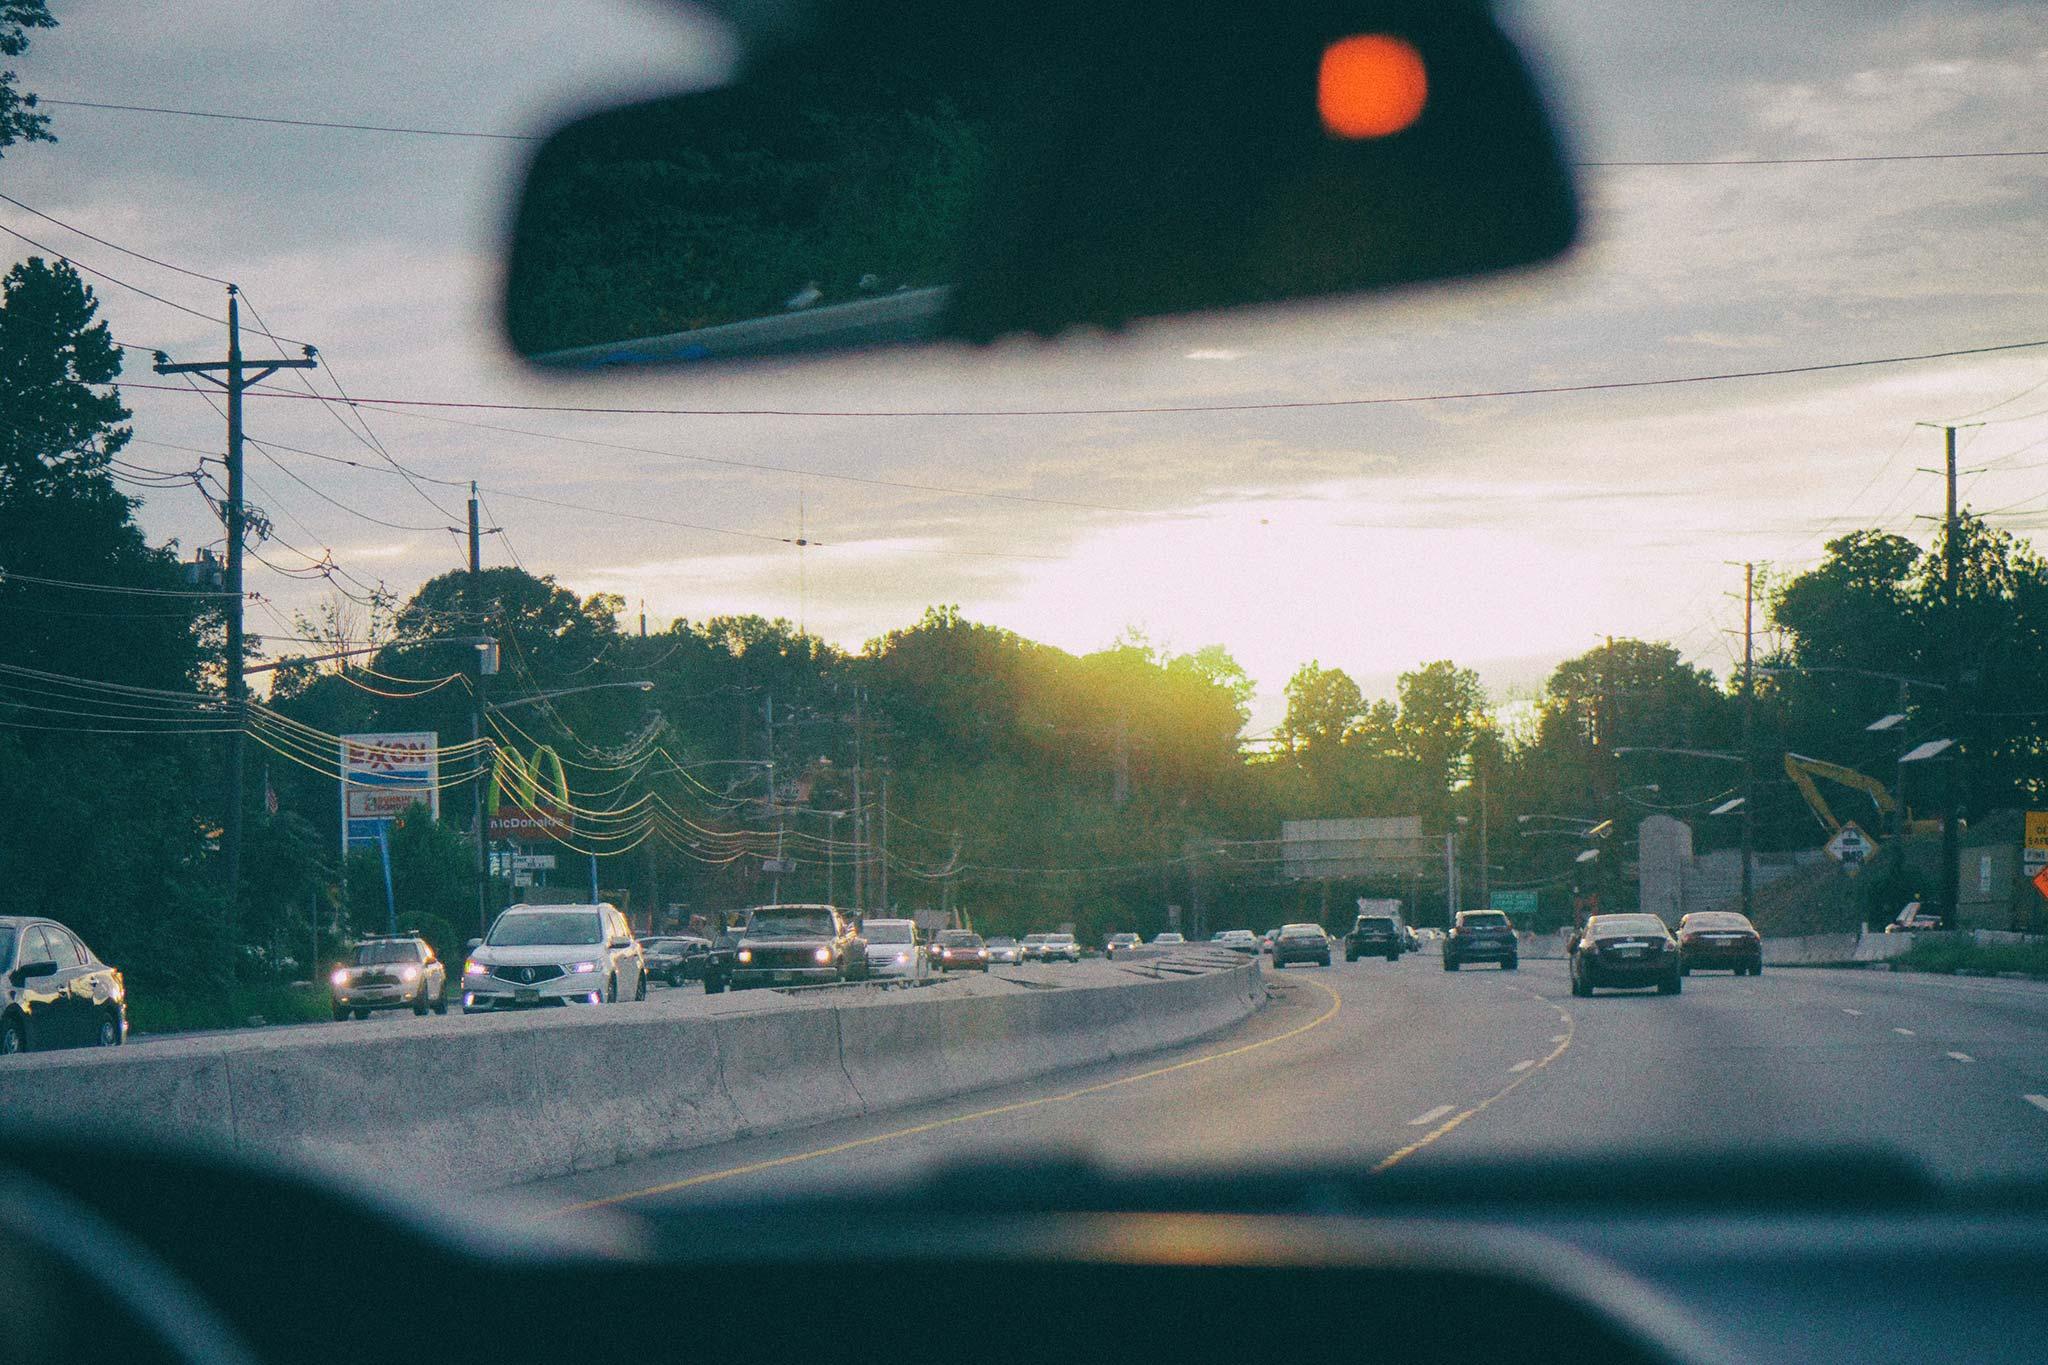 Auto Accident Attorney - Car Accident Attorney - Jacksonville Auto Accident Attorney - Brandon Auto Accident Attorney - Tampa Auto Accident Attorney - St. Augustine Auto Accident Attorney - Lawrence Najem - Michael Ossi